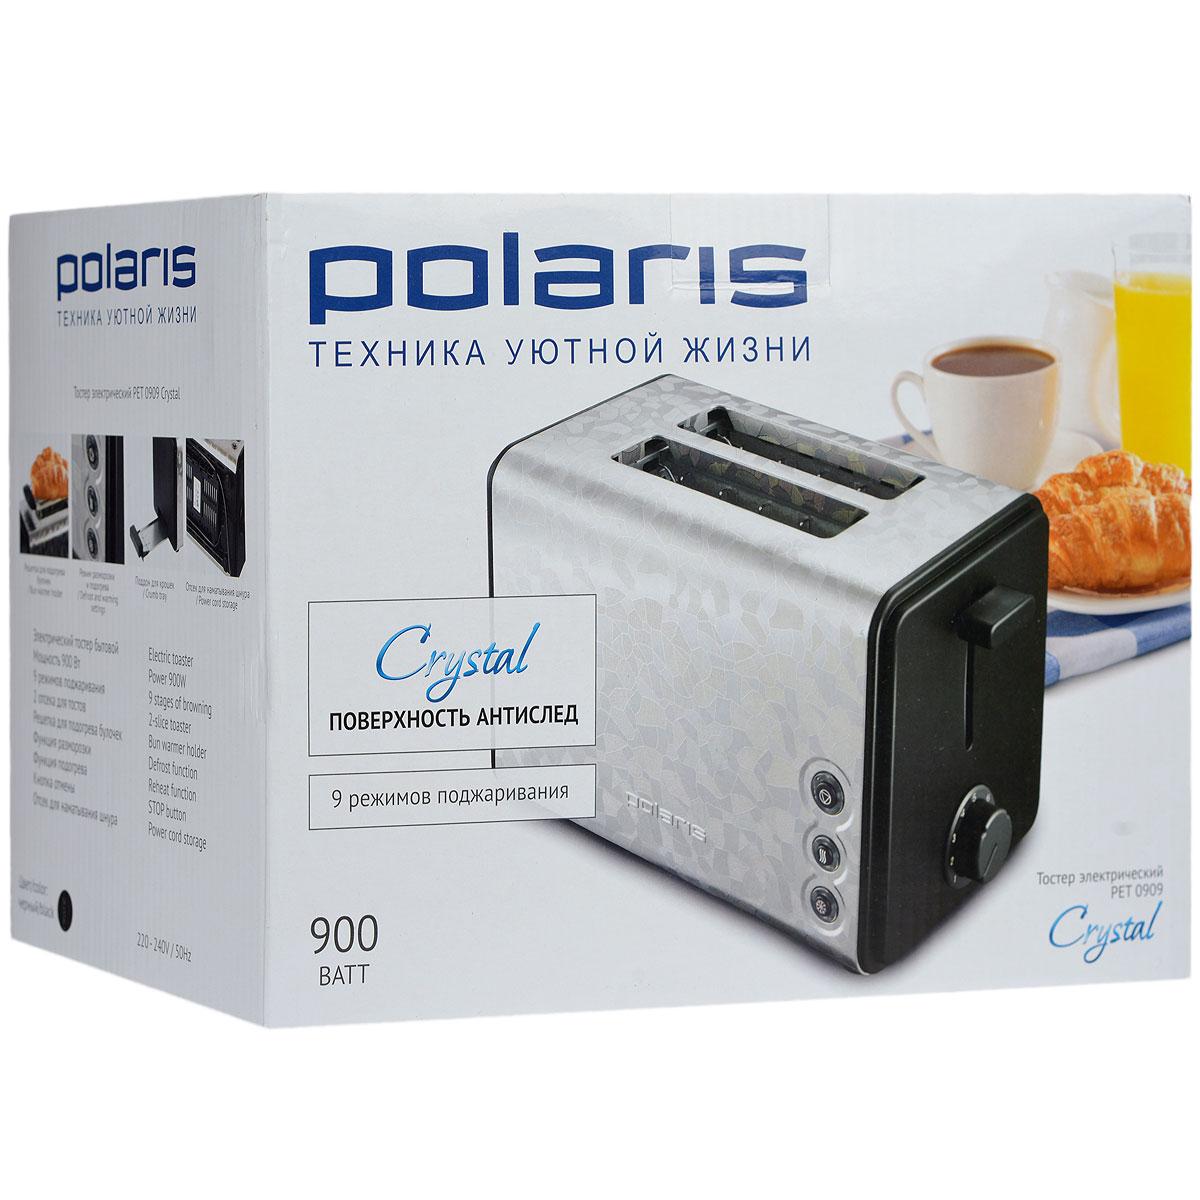 Polaris Pet 0909 Crystal тостер